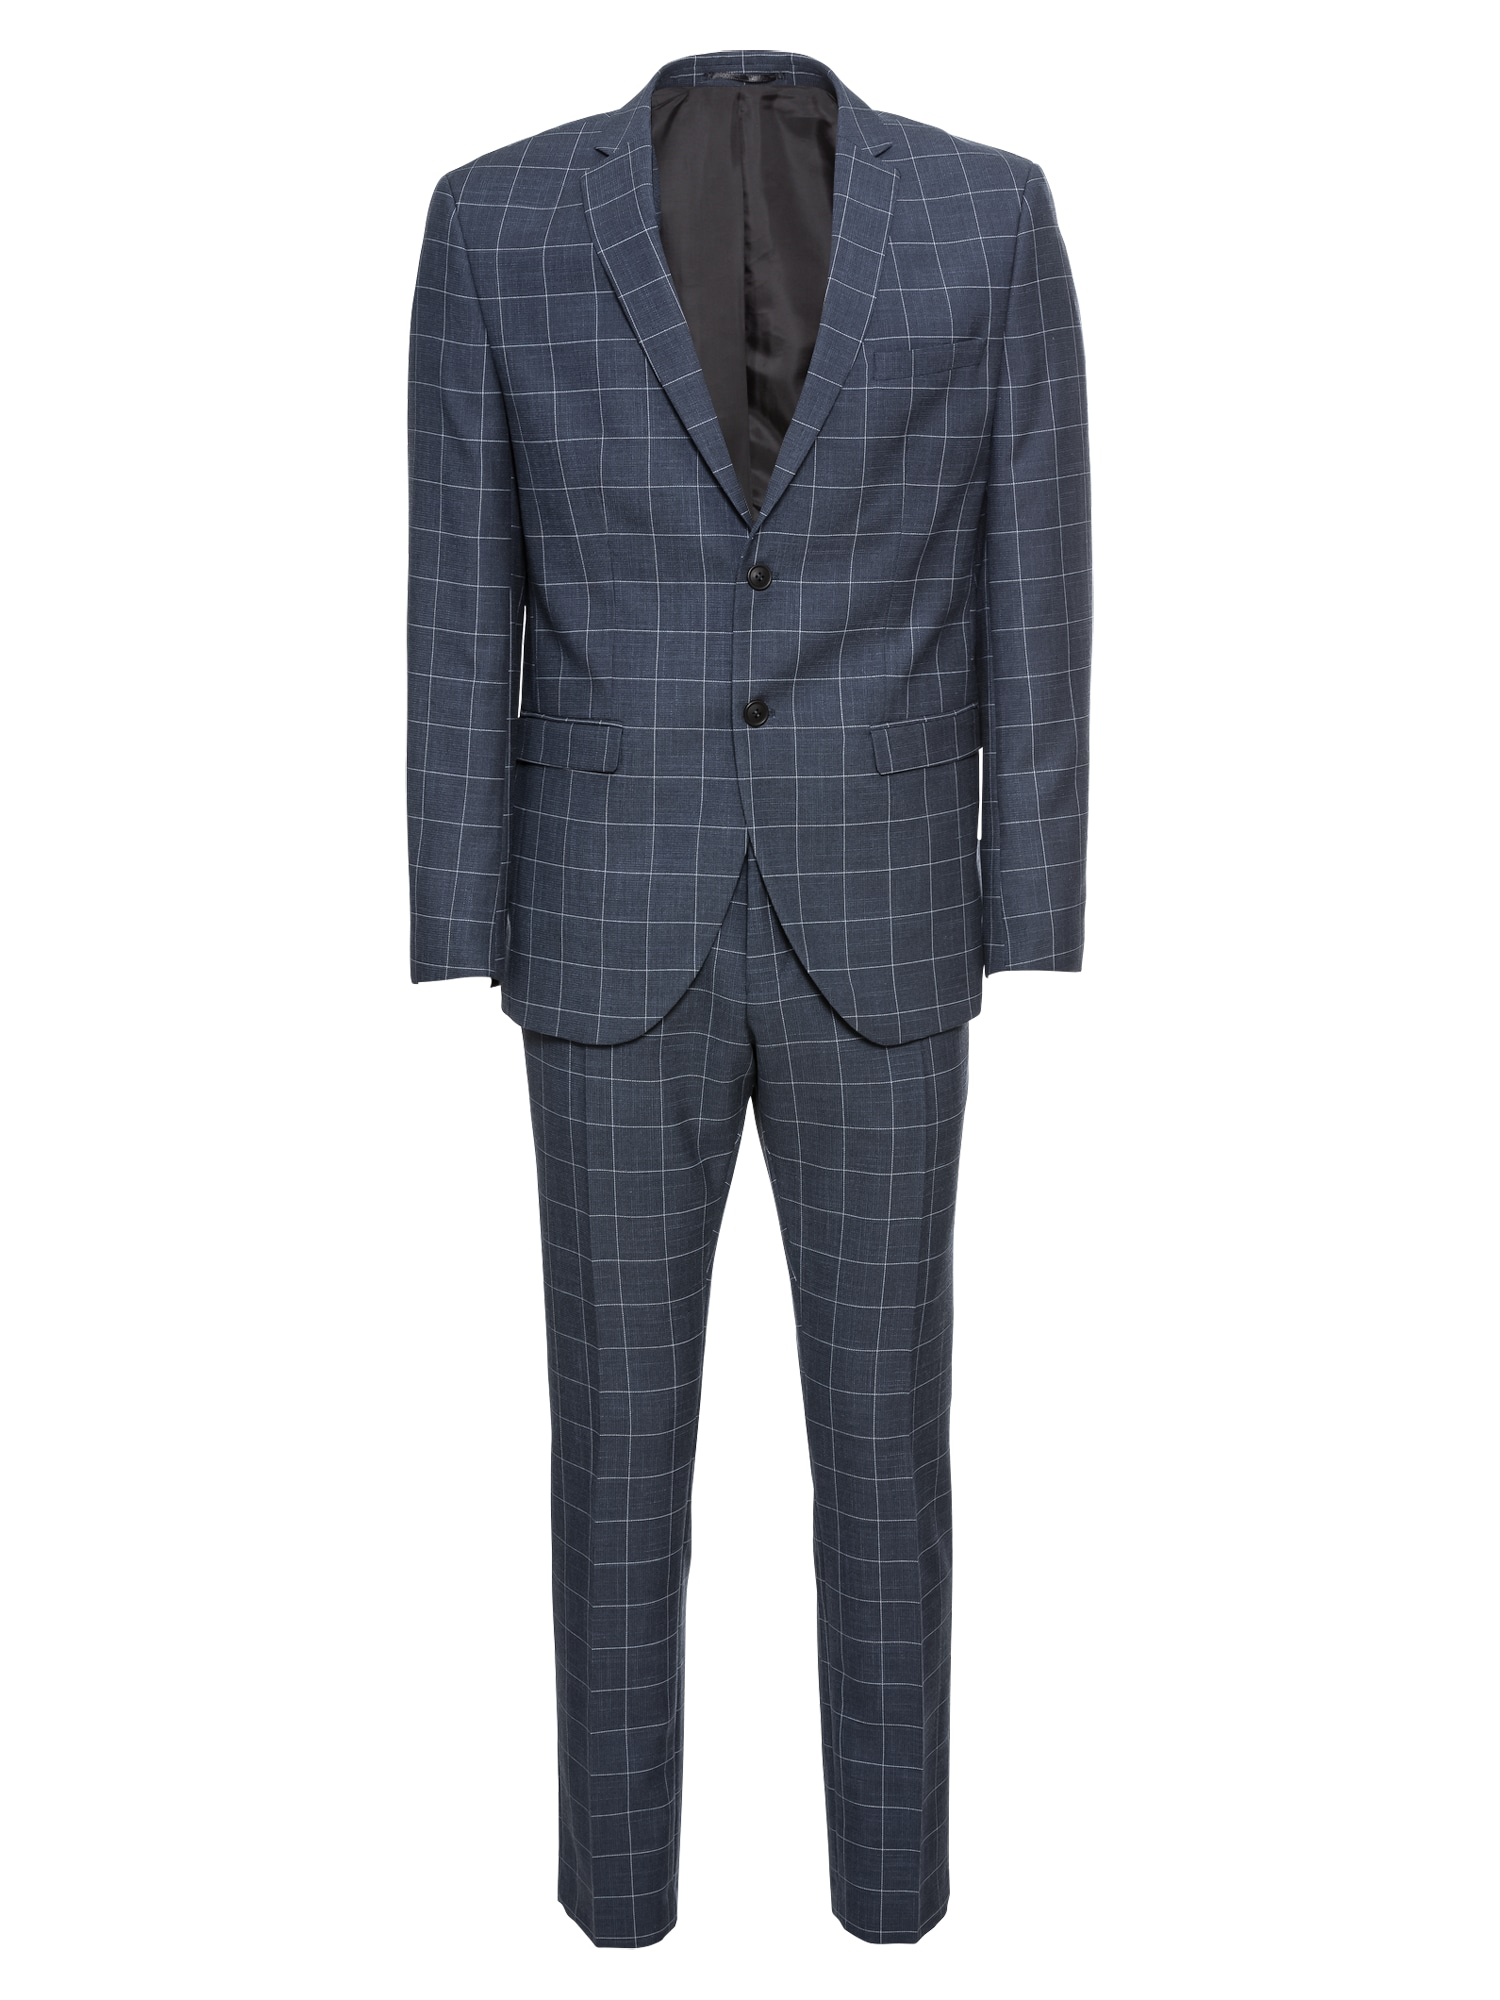 Oblek Myloair Check Suit B Ex tmavě modrá SELECTED HOMME